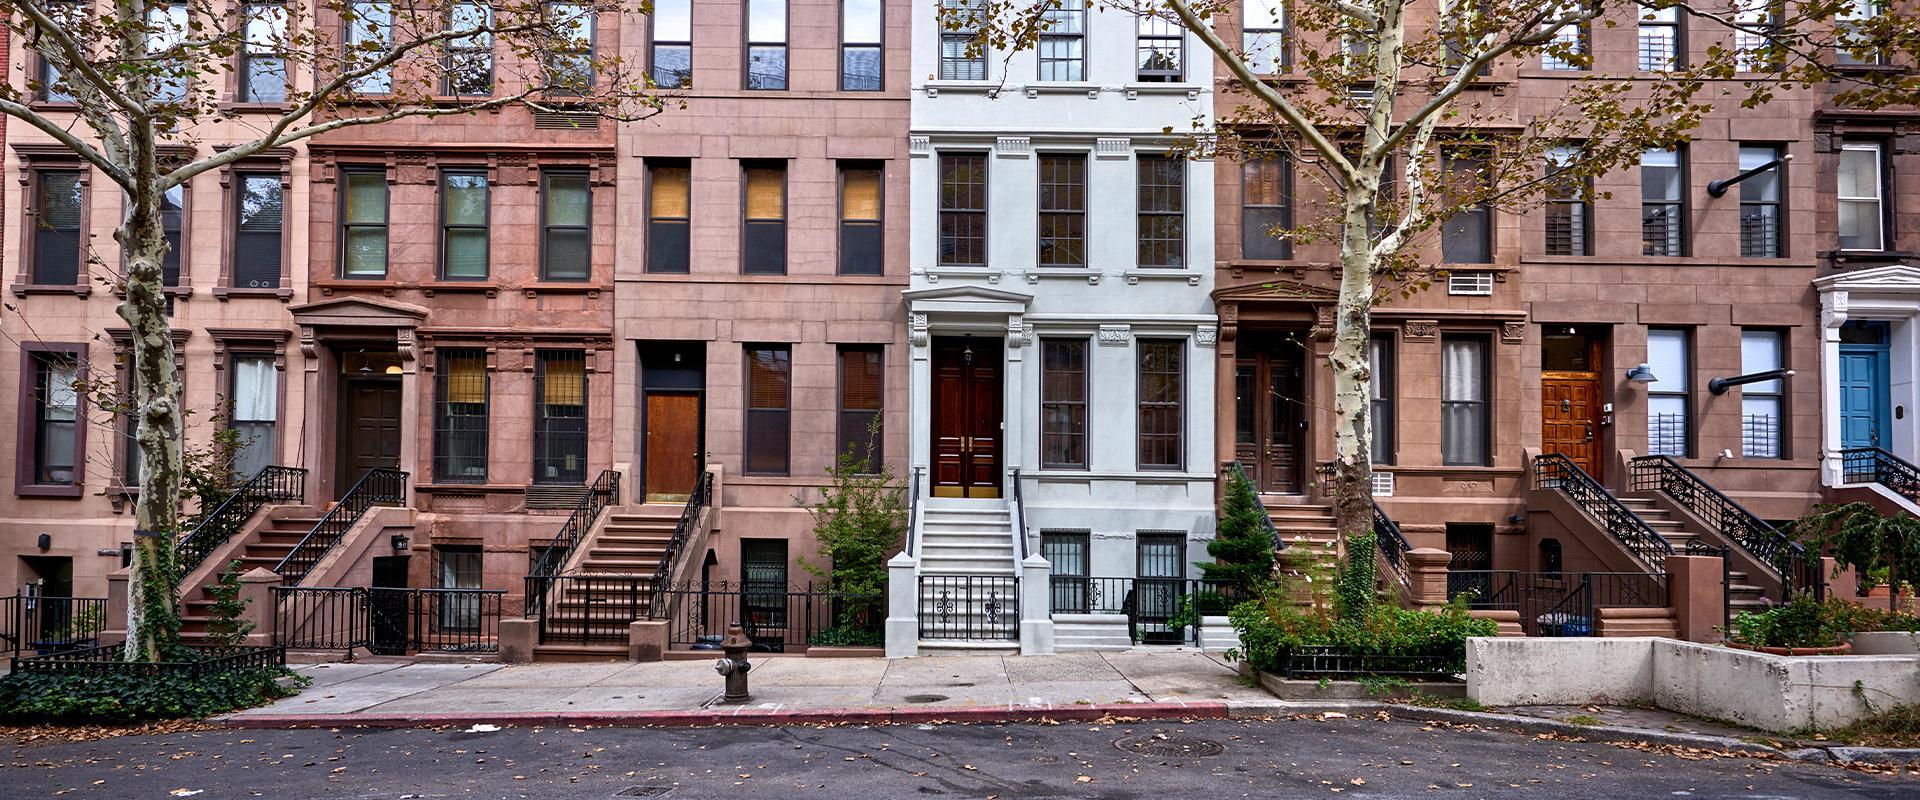 neighborhood in new york